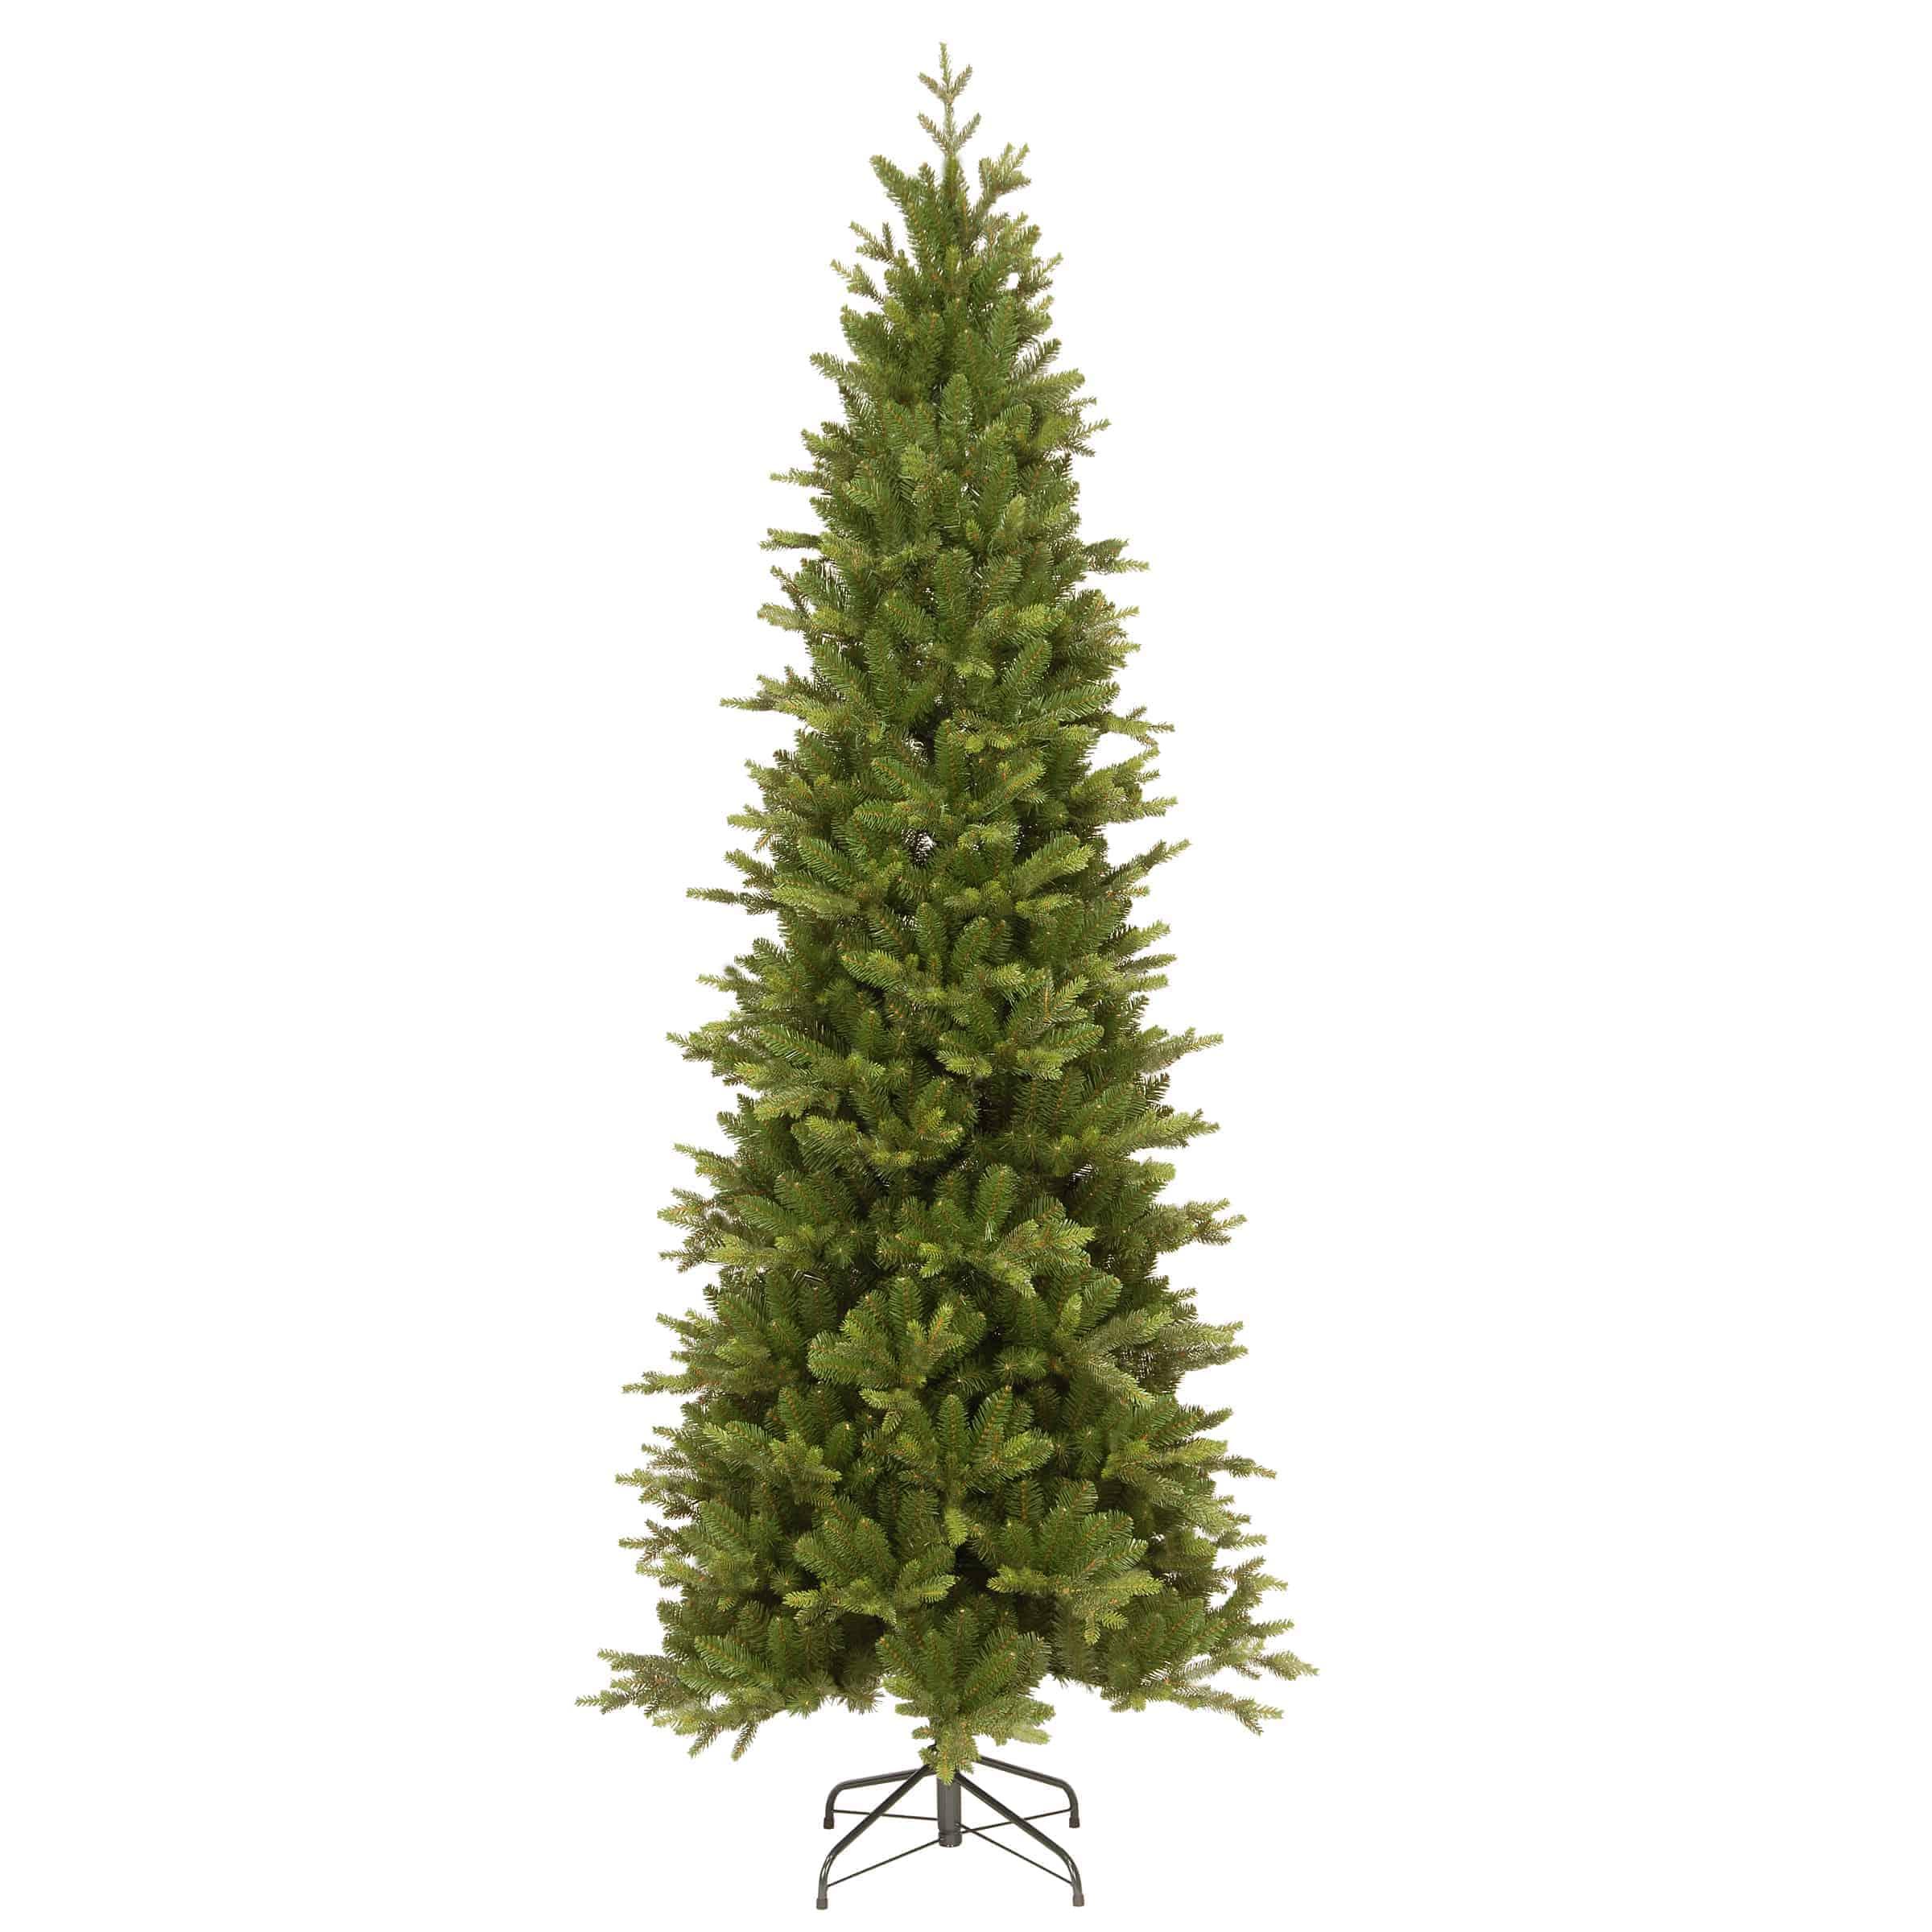 6ft & 7ft Artificial Christmas Trees (Un-Lit), Artificial ...